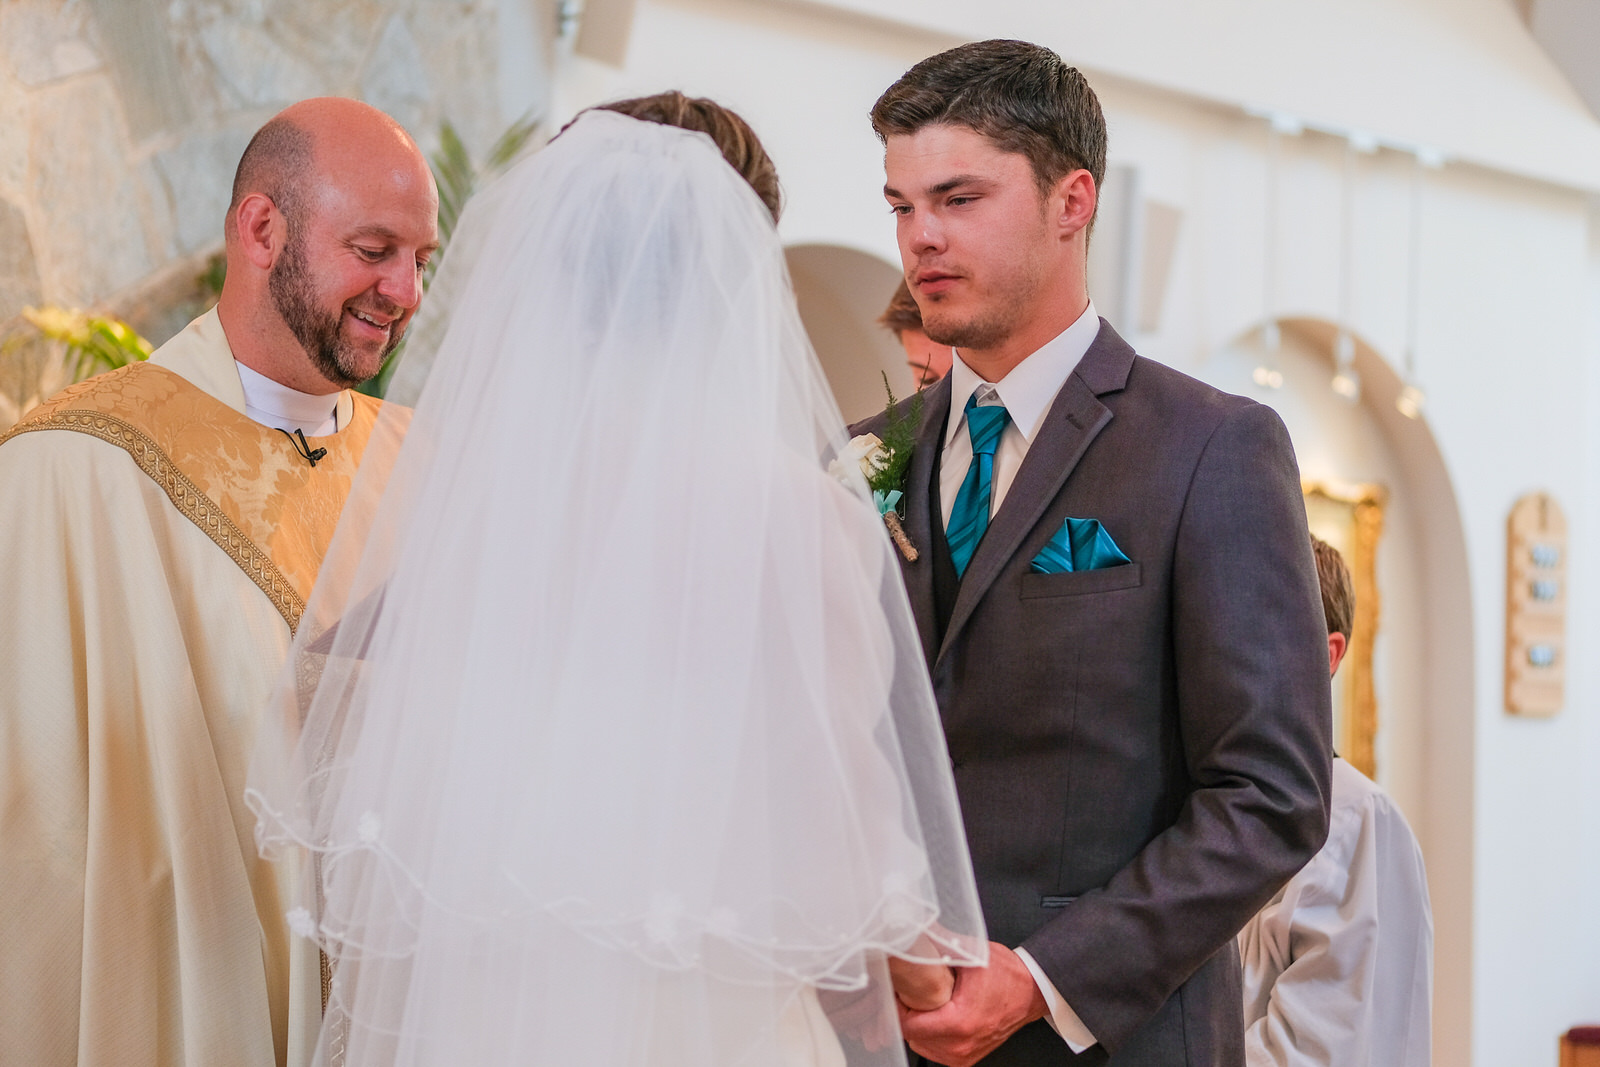 southern-nh-wedding-photography-367-1.jpg